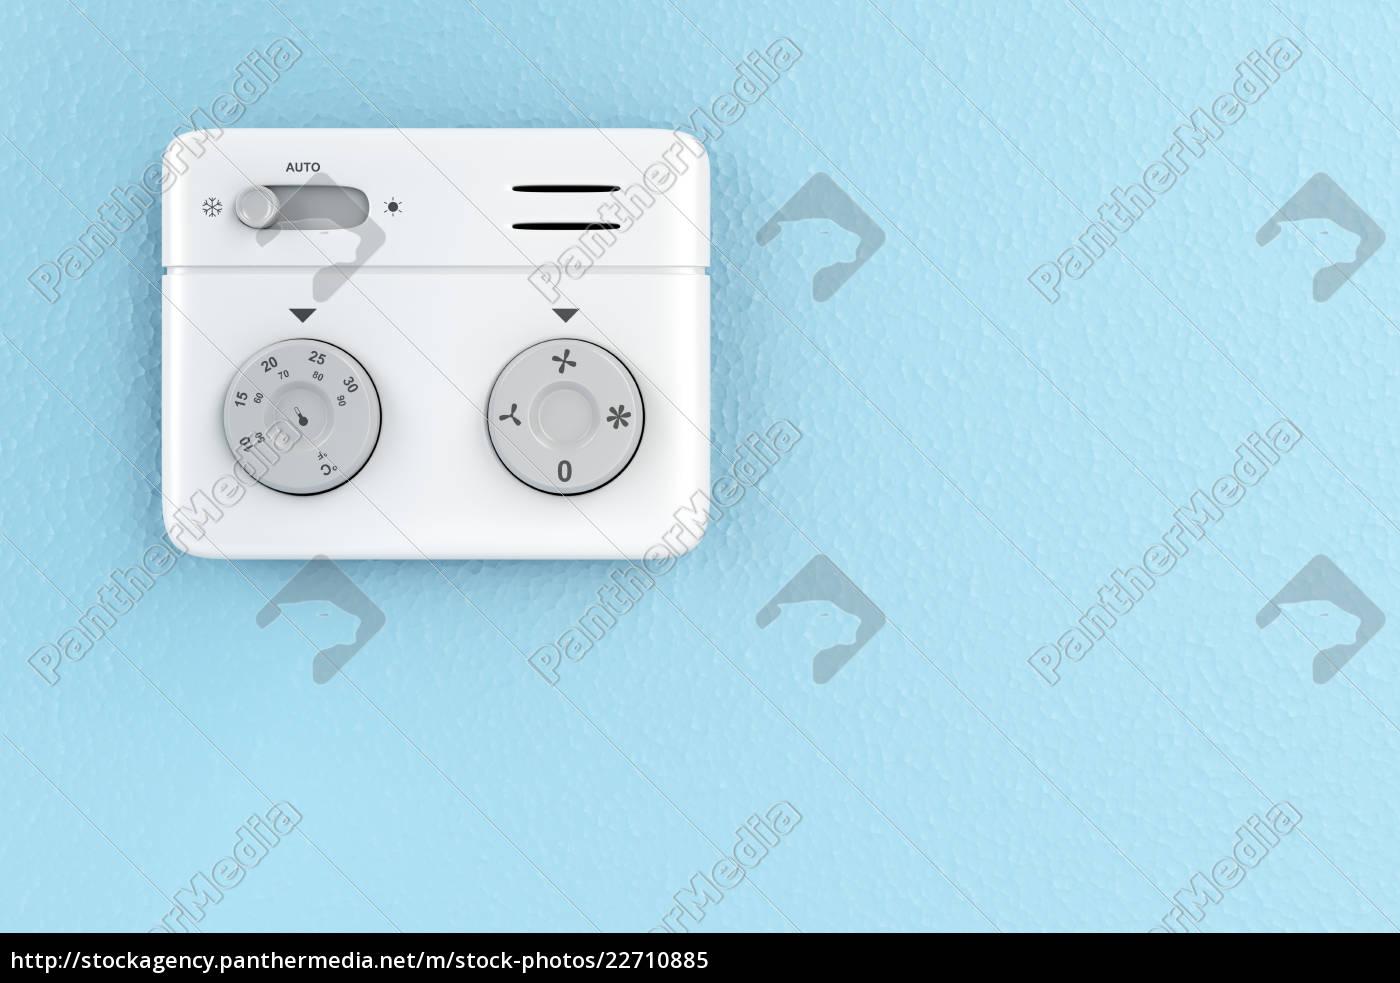 termostato - 22710885